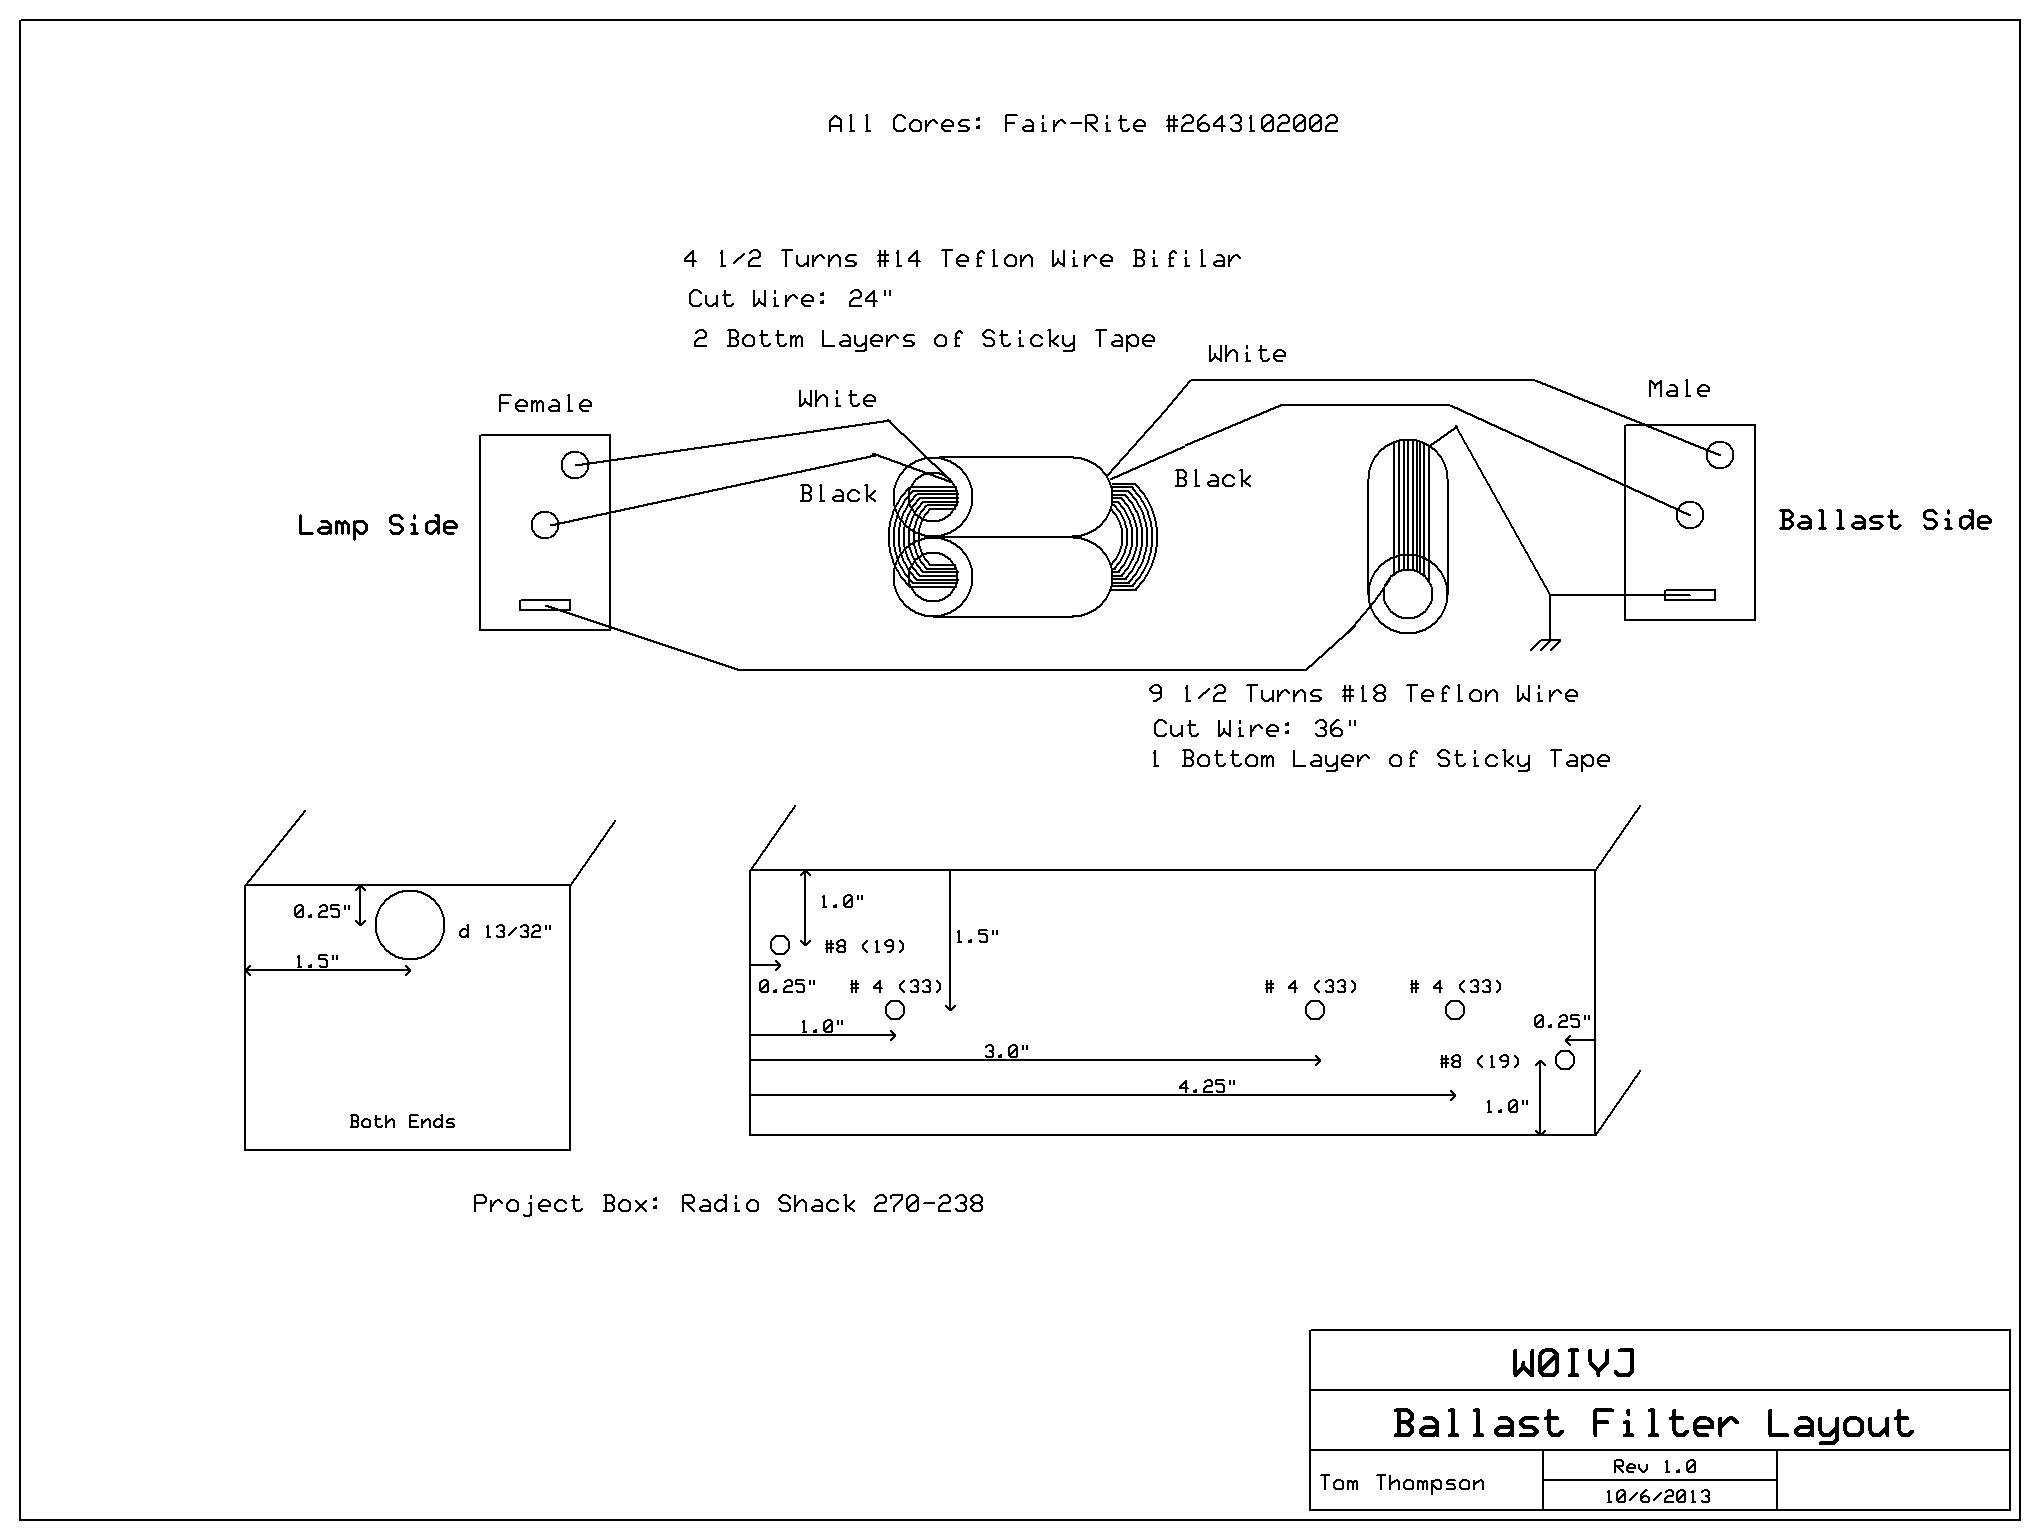 Pleasing Any Diy Wiring Teks For Hps Ballasts Grassroots Mycotopia Standard Wiring 101 Mecadwellnesstrialsorg